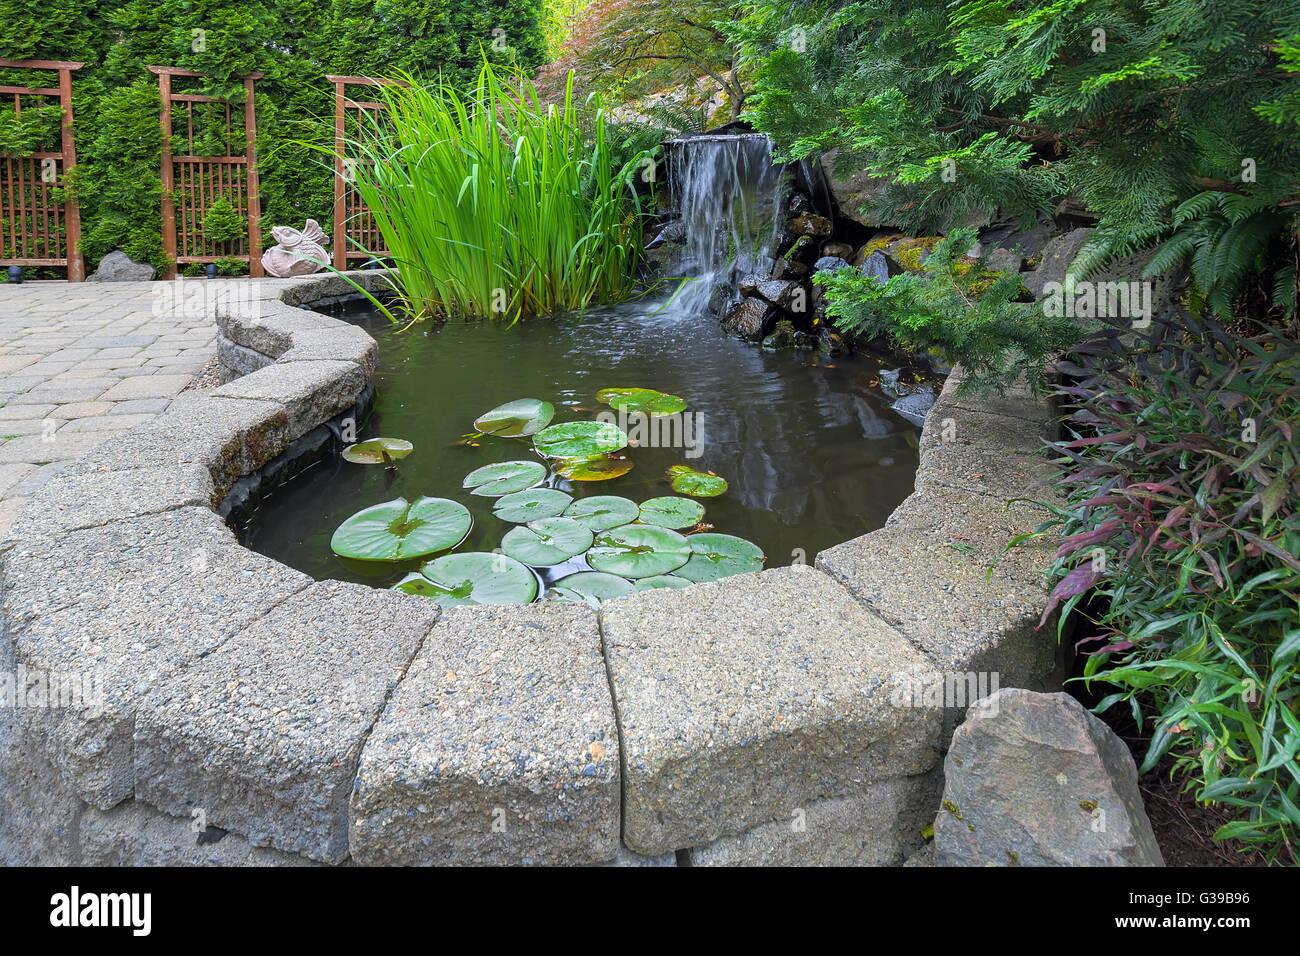 Garden Backyard Pond With Waterfall Water Plants Brick